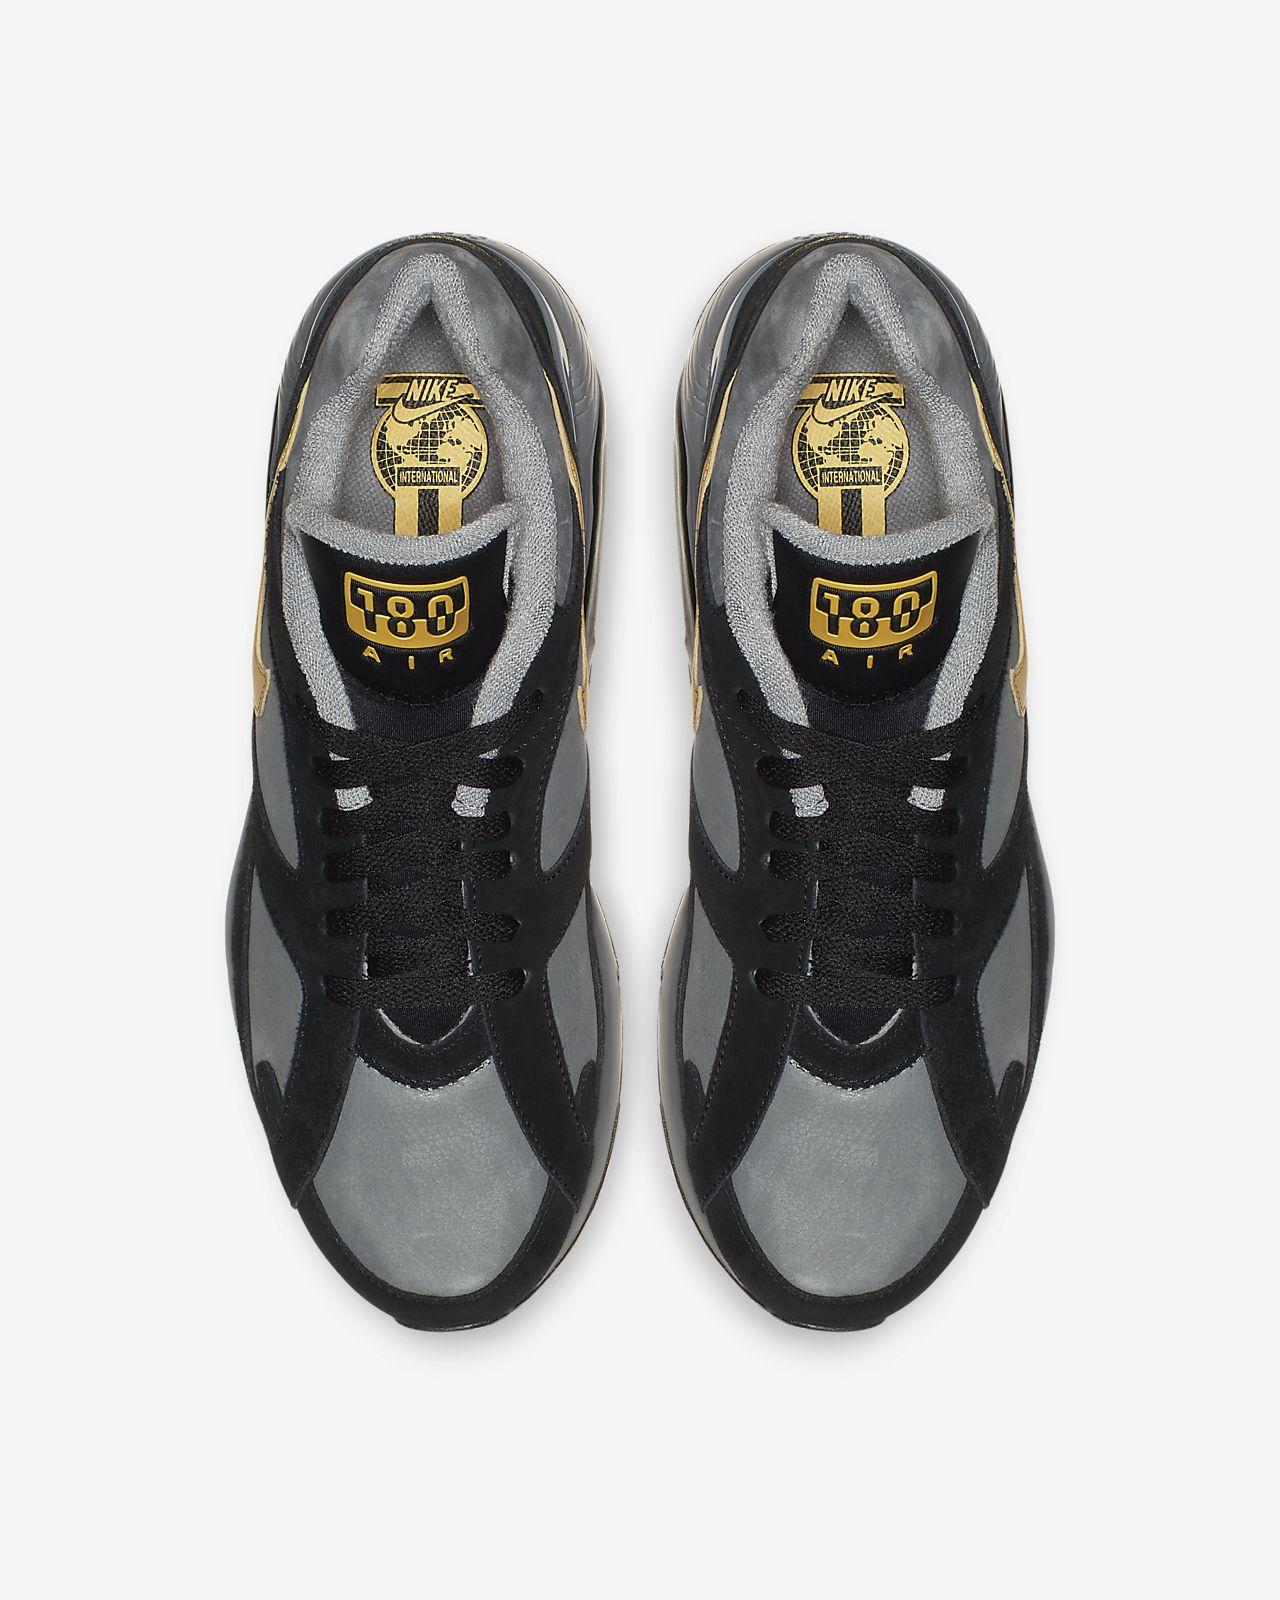 52384d975912 Nike Air Max 180 Men s Shoe. Nike.com AU